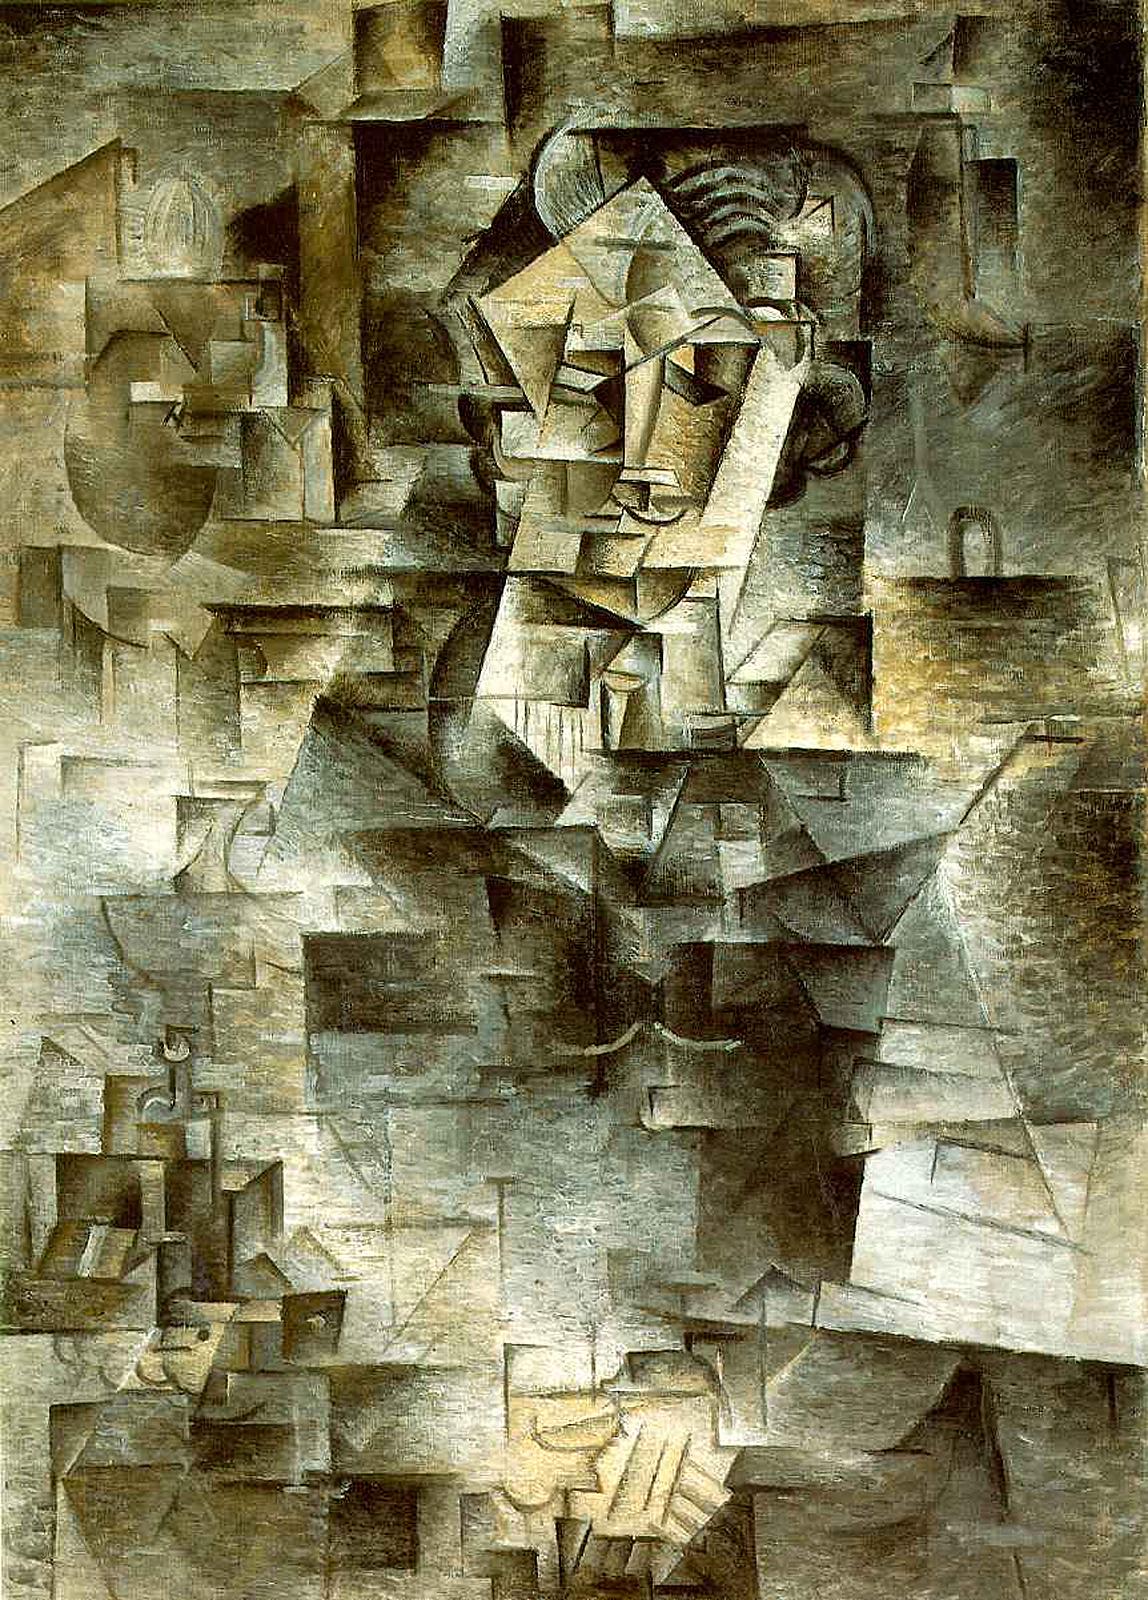 Edwing Mendez: Type 3: Stein & Cubism